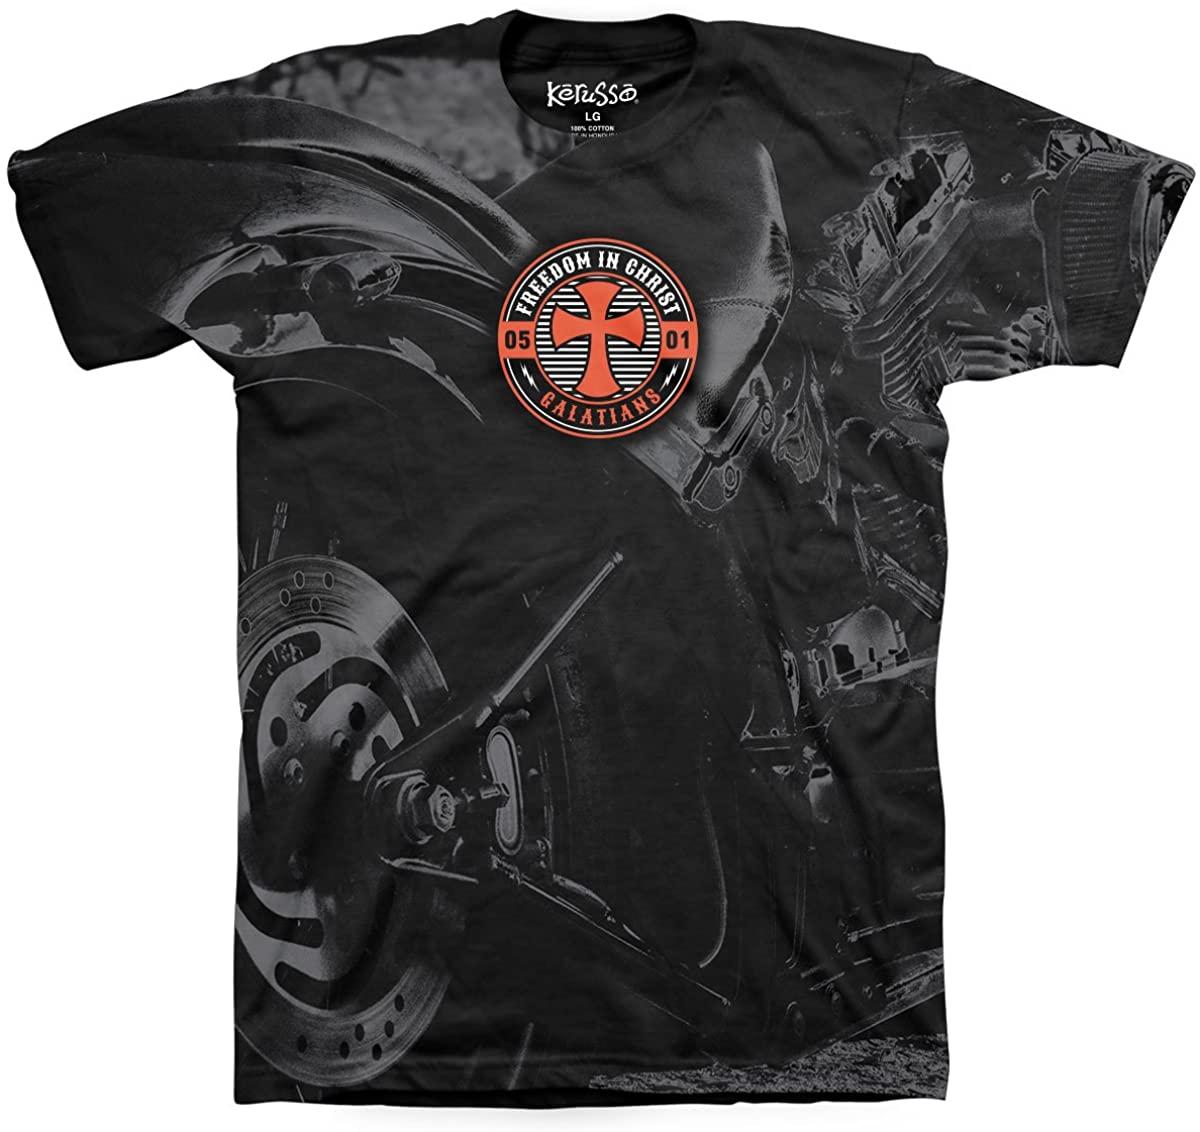 Kerusso Men's Motorcycle T-Shirt - Black -